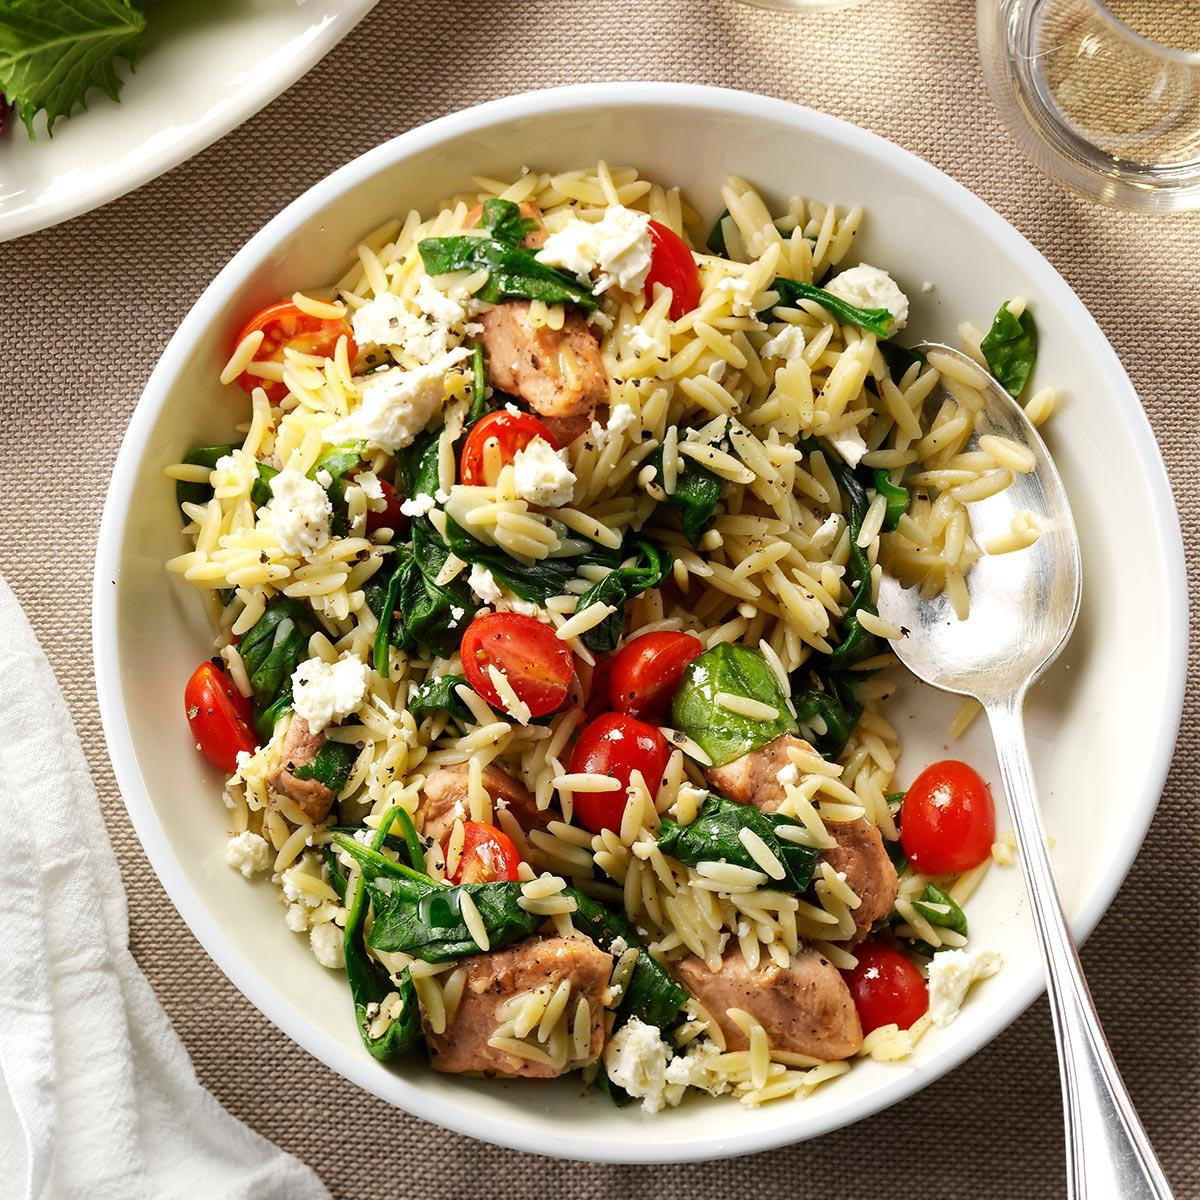 Healthy Dinner Recipes Easy  Mediterranean Pork and Orzo Recipe